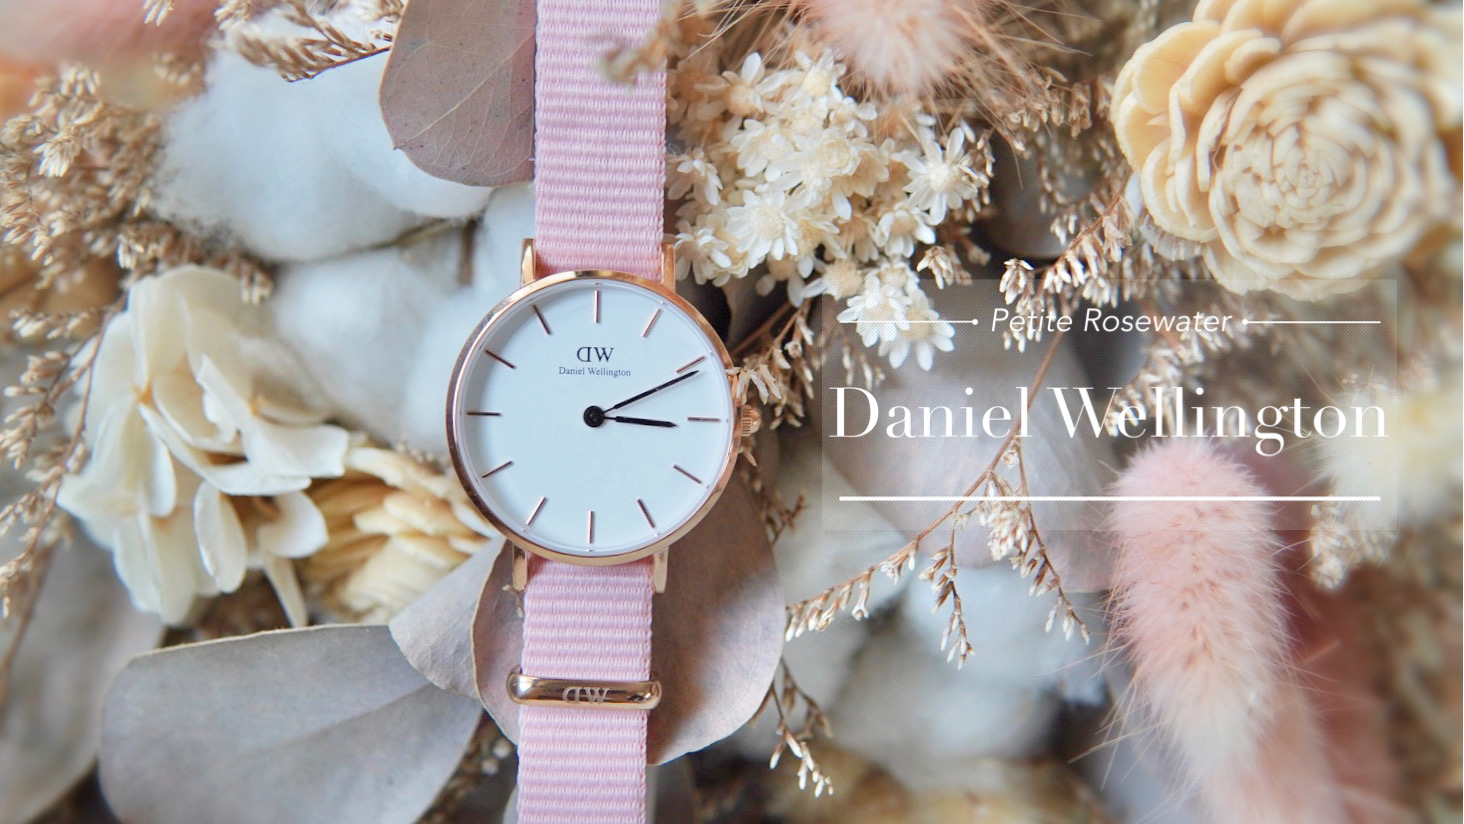 ☆【DW折扣碼】浪漫櫻花粉織紋錶帶Petite Rosewater。玫瑰奶茶系穿搭(2020折扣碼:kaikai00603) @凱的日本食尚日記